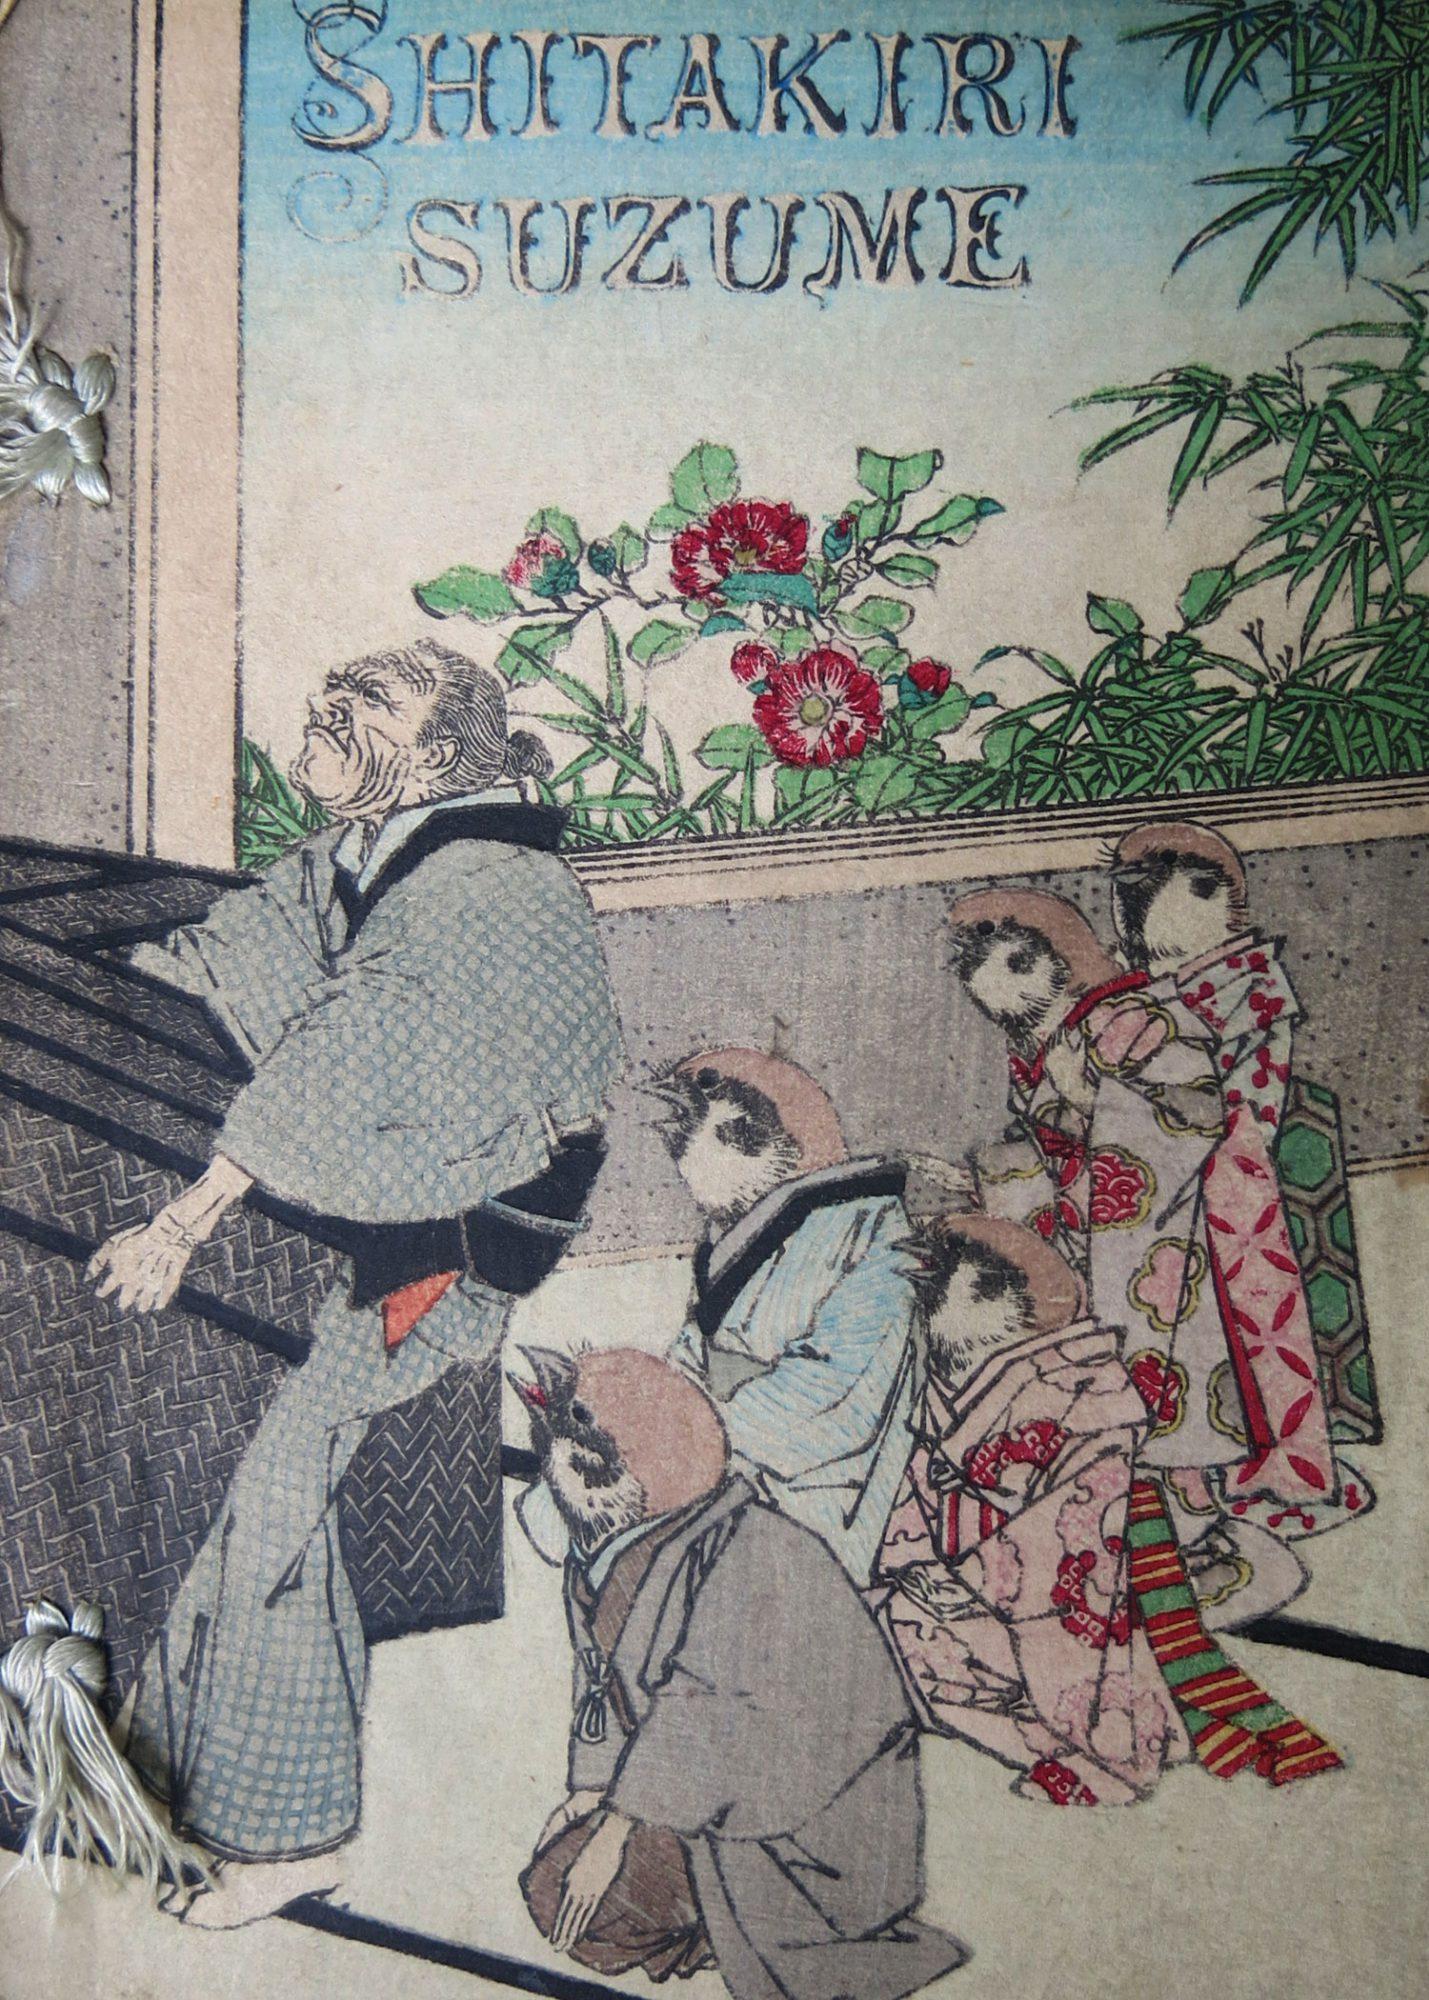 Shitakiri suzume, Le moineau qui avait la langue coupée. Traducteur : [Joseph] Dautremer. Illustrateur : 小林永濯Kobayashi Eitaku (Sansai)